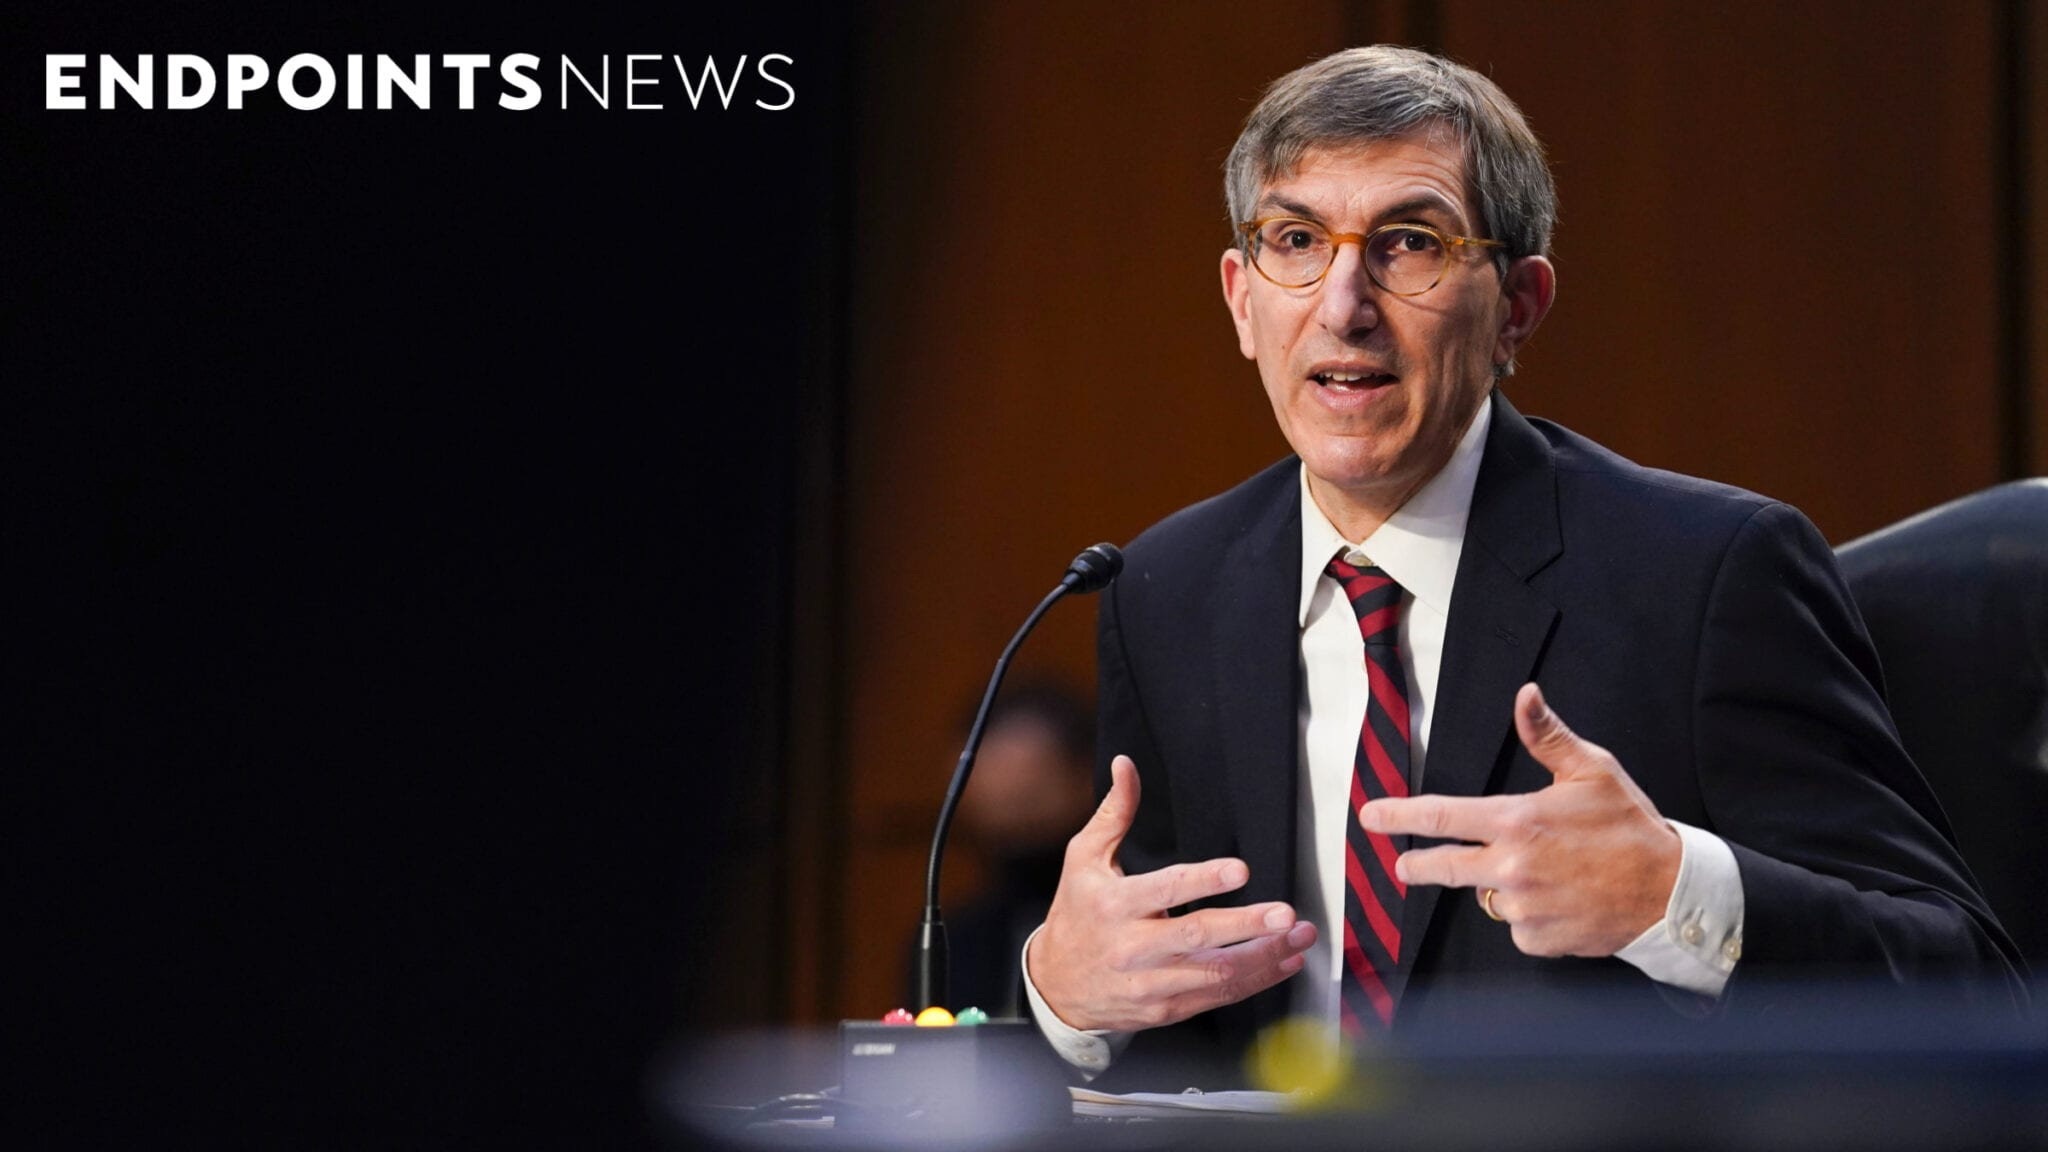 FDA closes the door on EUA requests for some future Covid-19 vaccines